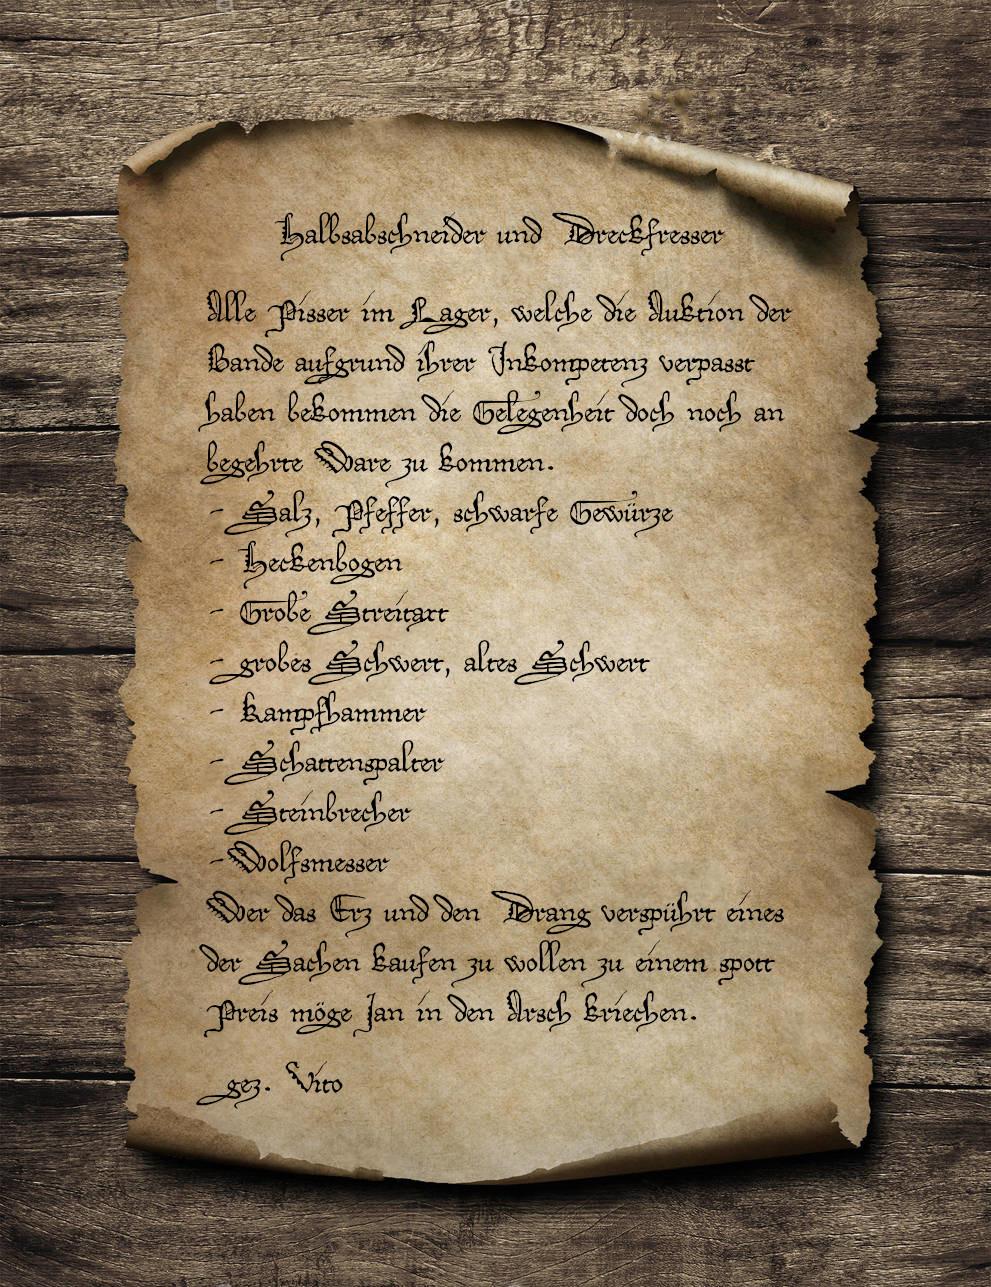 JanInDenArschKriecheny18kis10.jpg